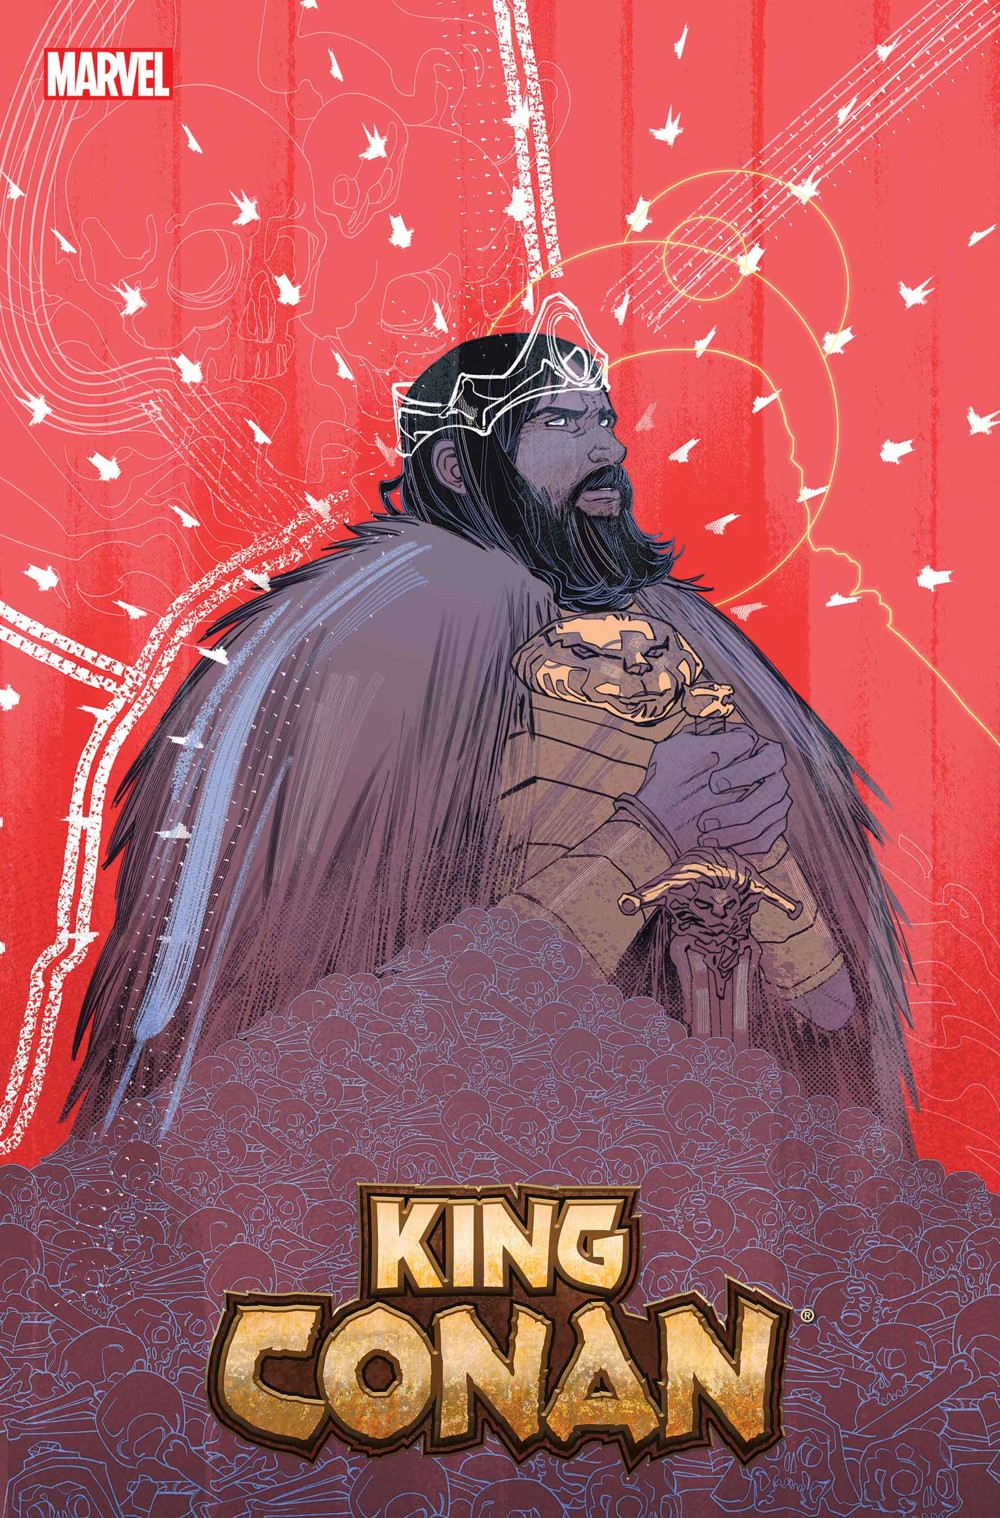 KINGCONAN2021001_Sauvage_Var Marvel Comics December 2021 Solicitations